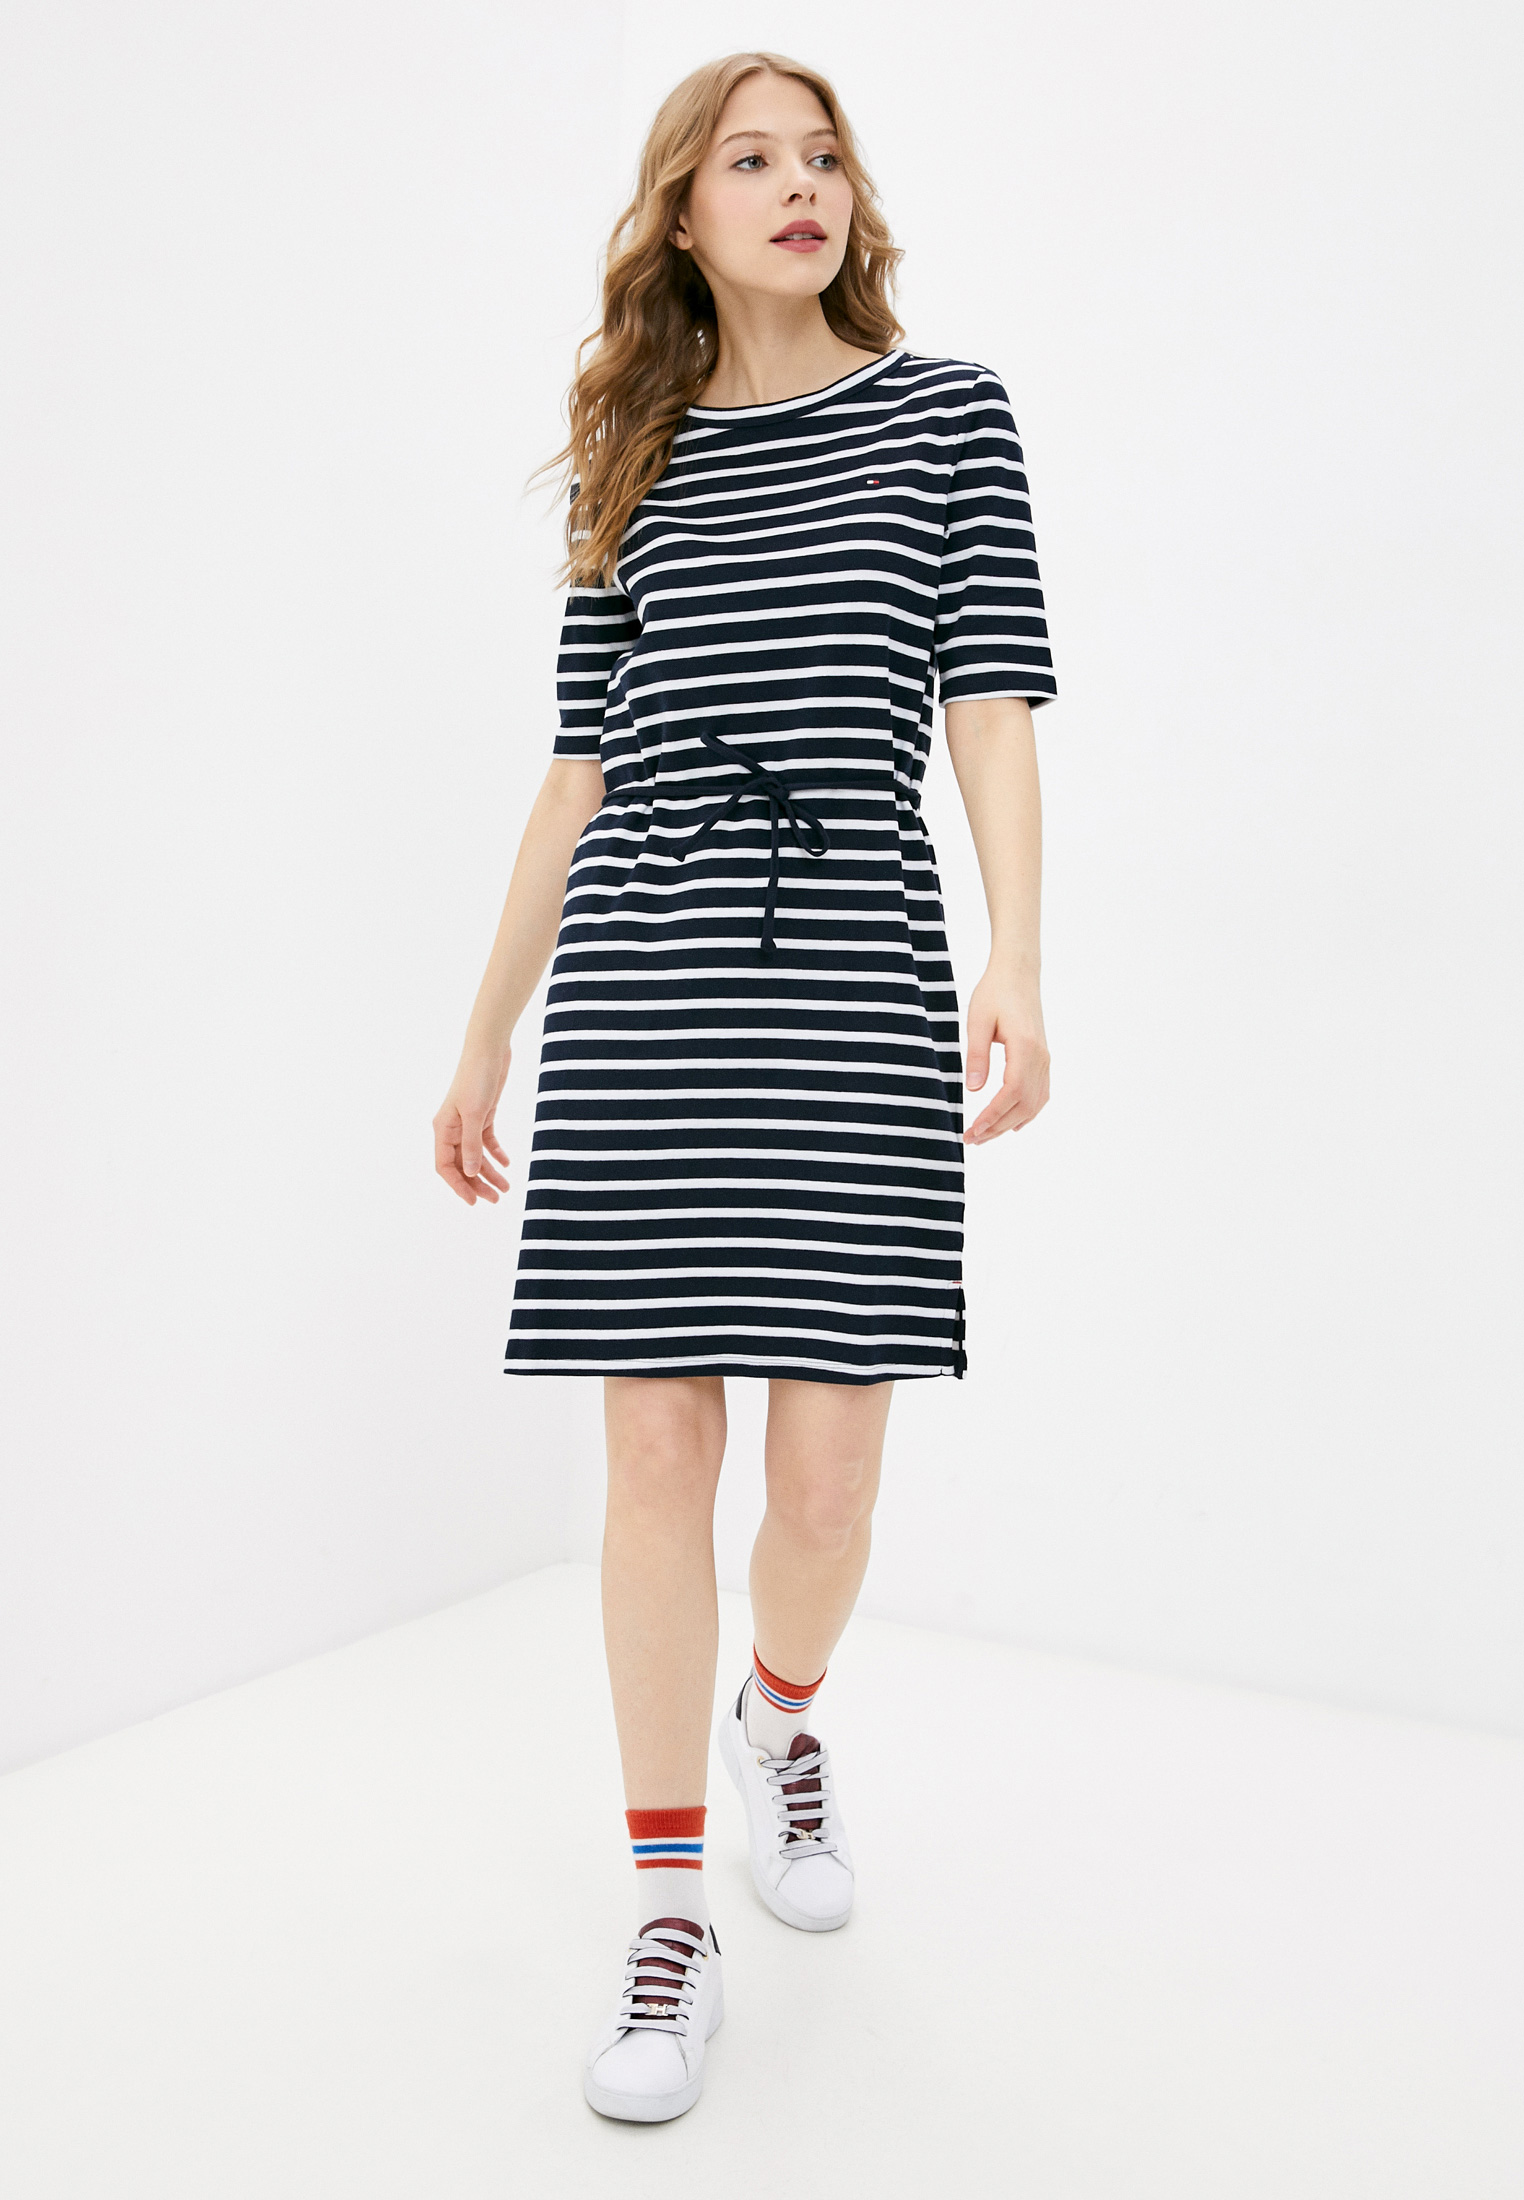 Платье Tommy Hilfiger (Томми Хилфигер) WW0WW30375: изображение 2